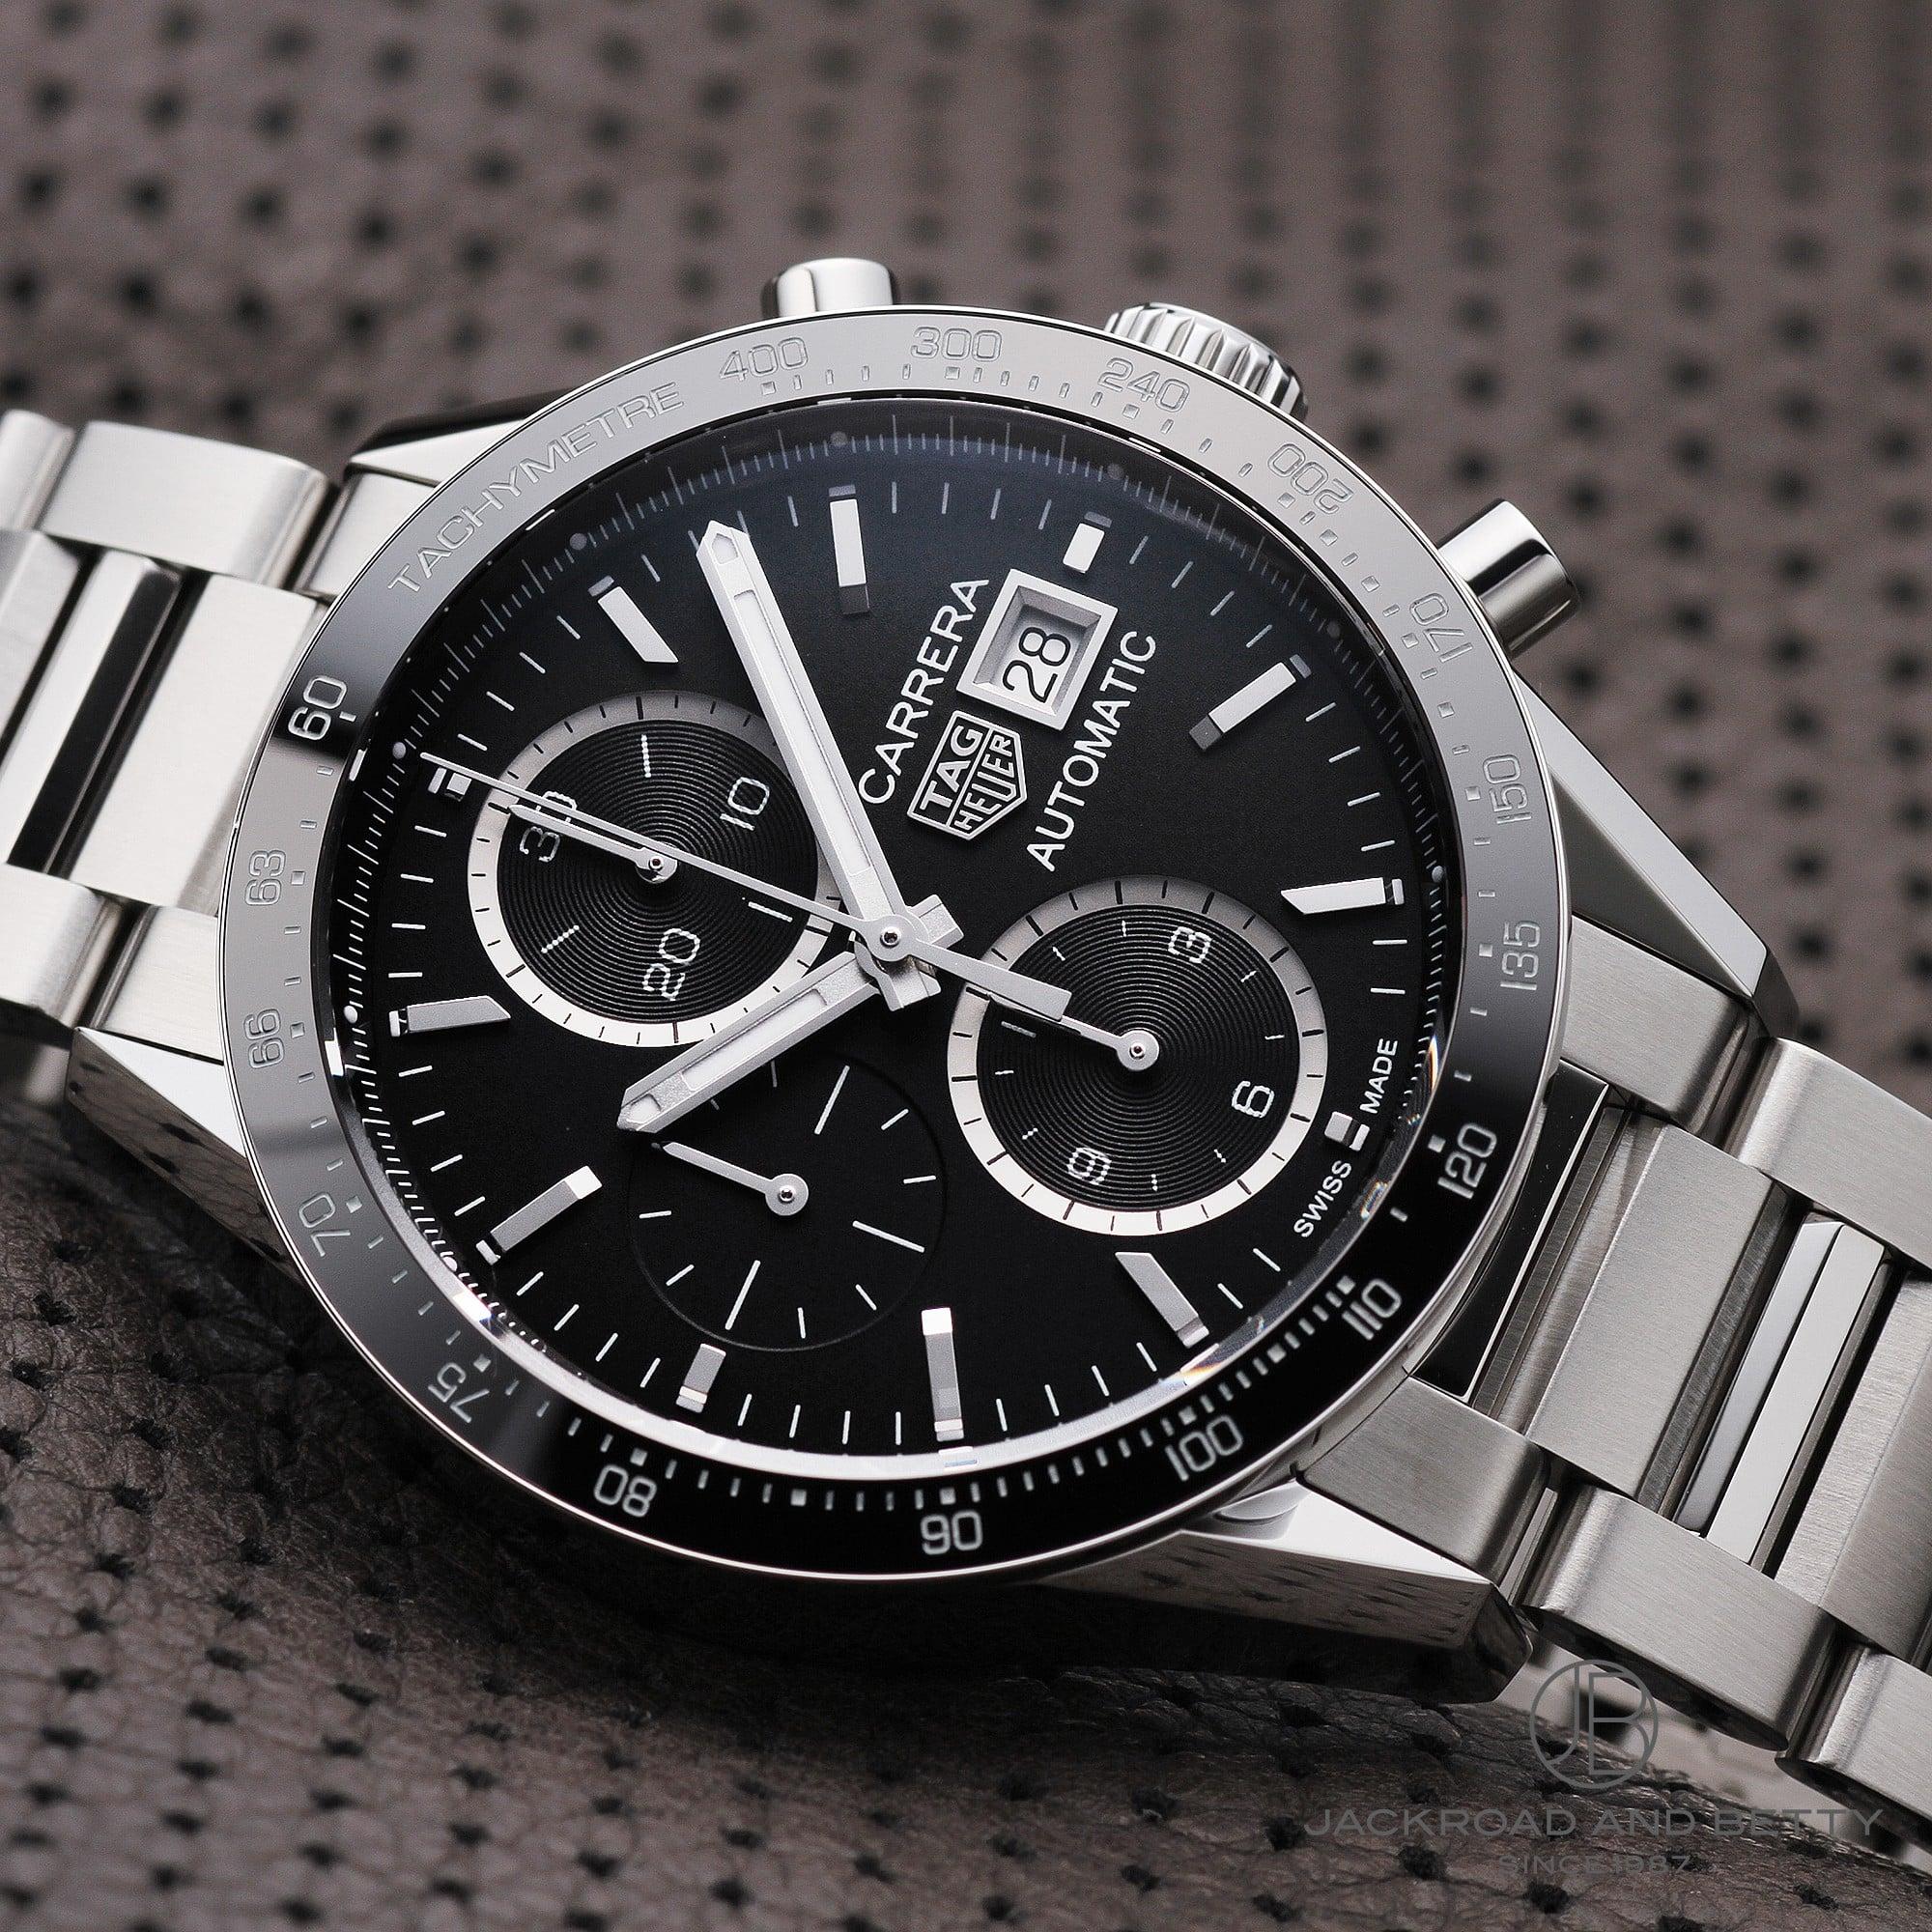 buy popular 1ac4a b179a Tag ホイヤー TAG HEUER カレラクロノグラフキャリバー 16 CV201AJ.BA0715 new article clock men